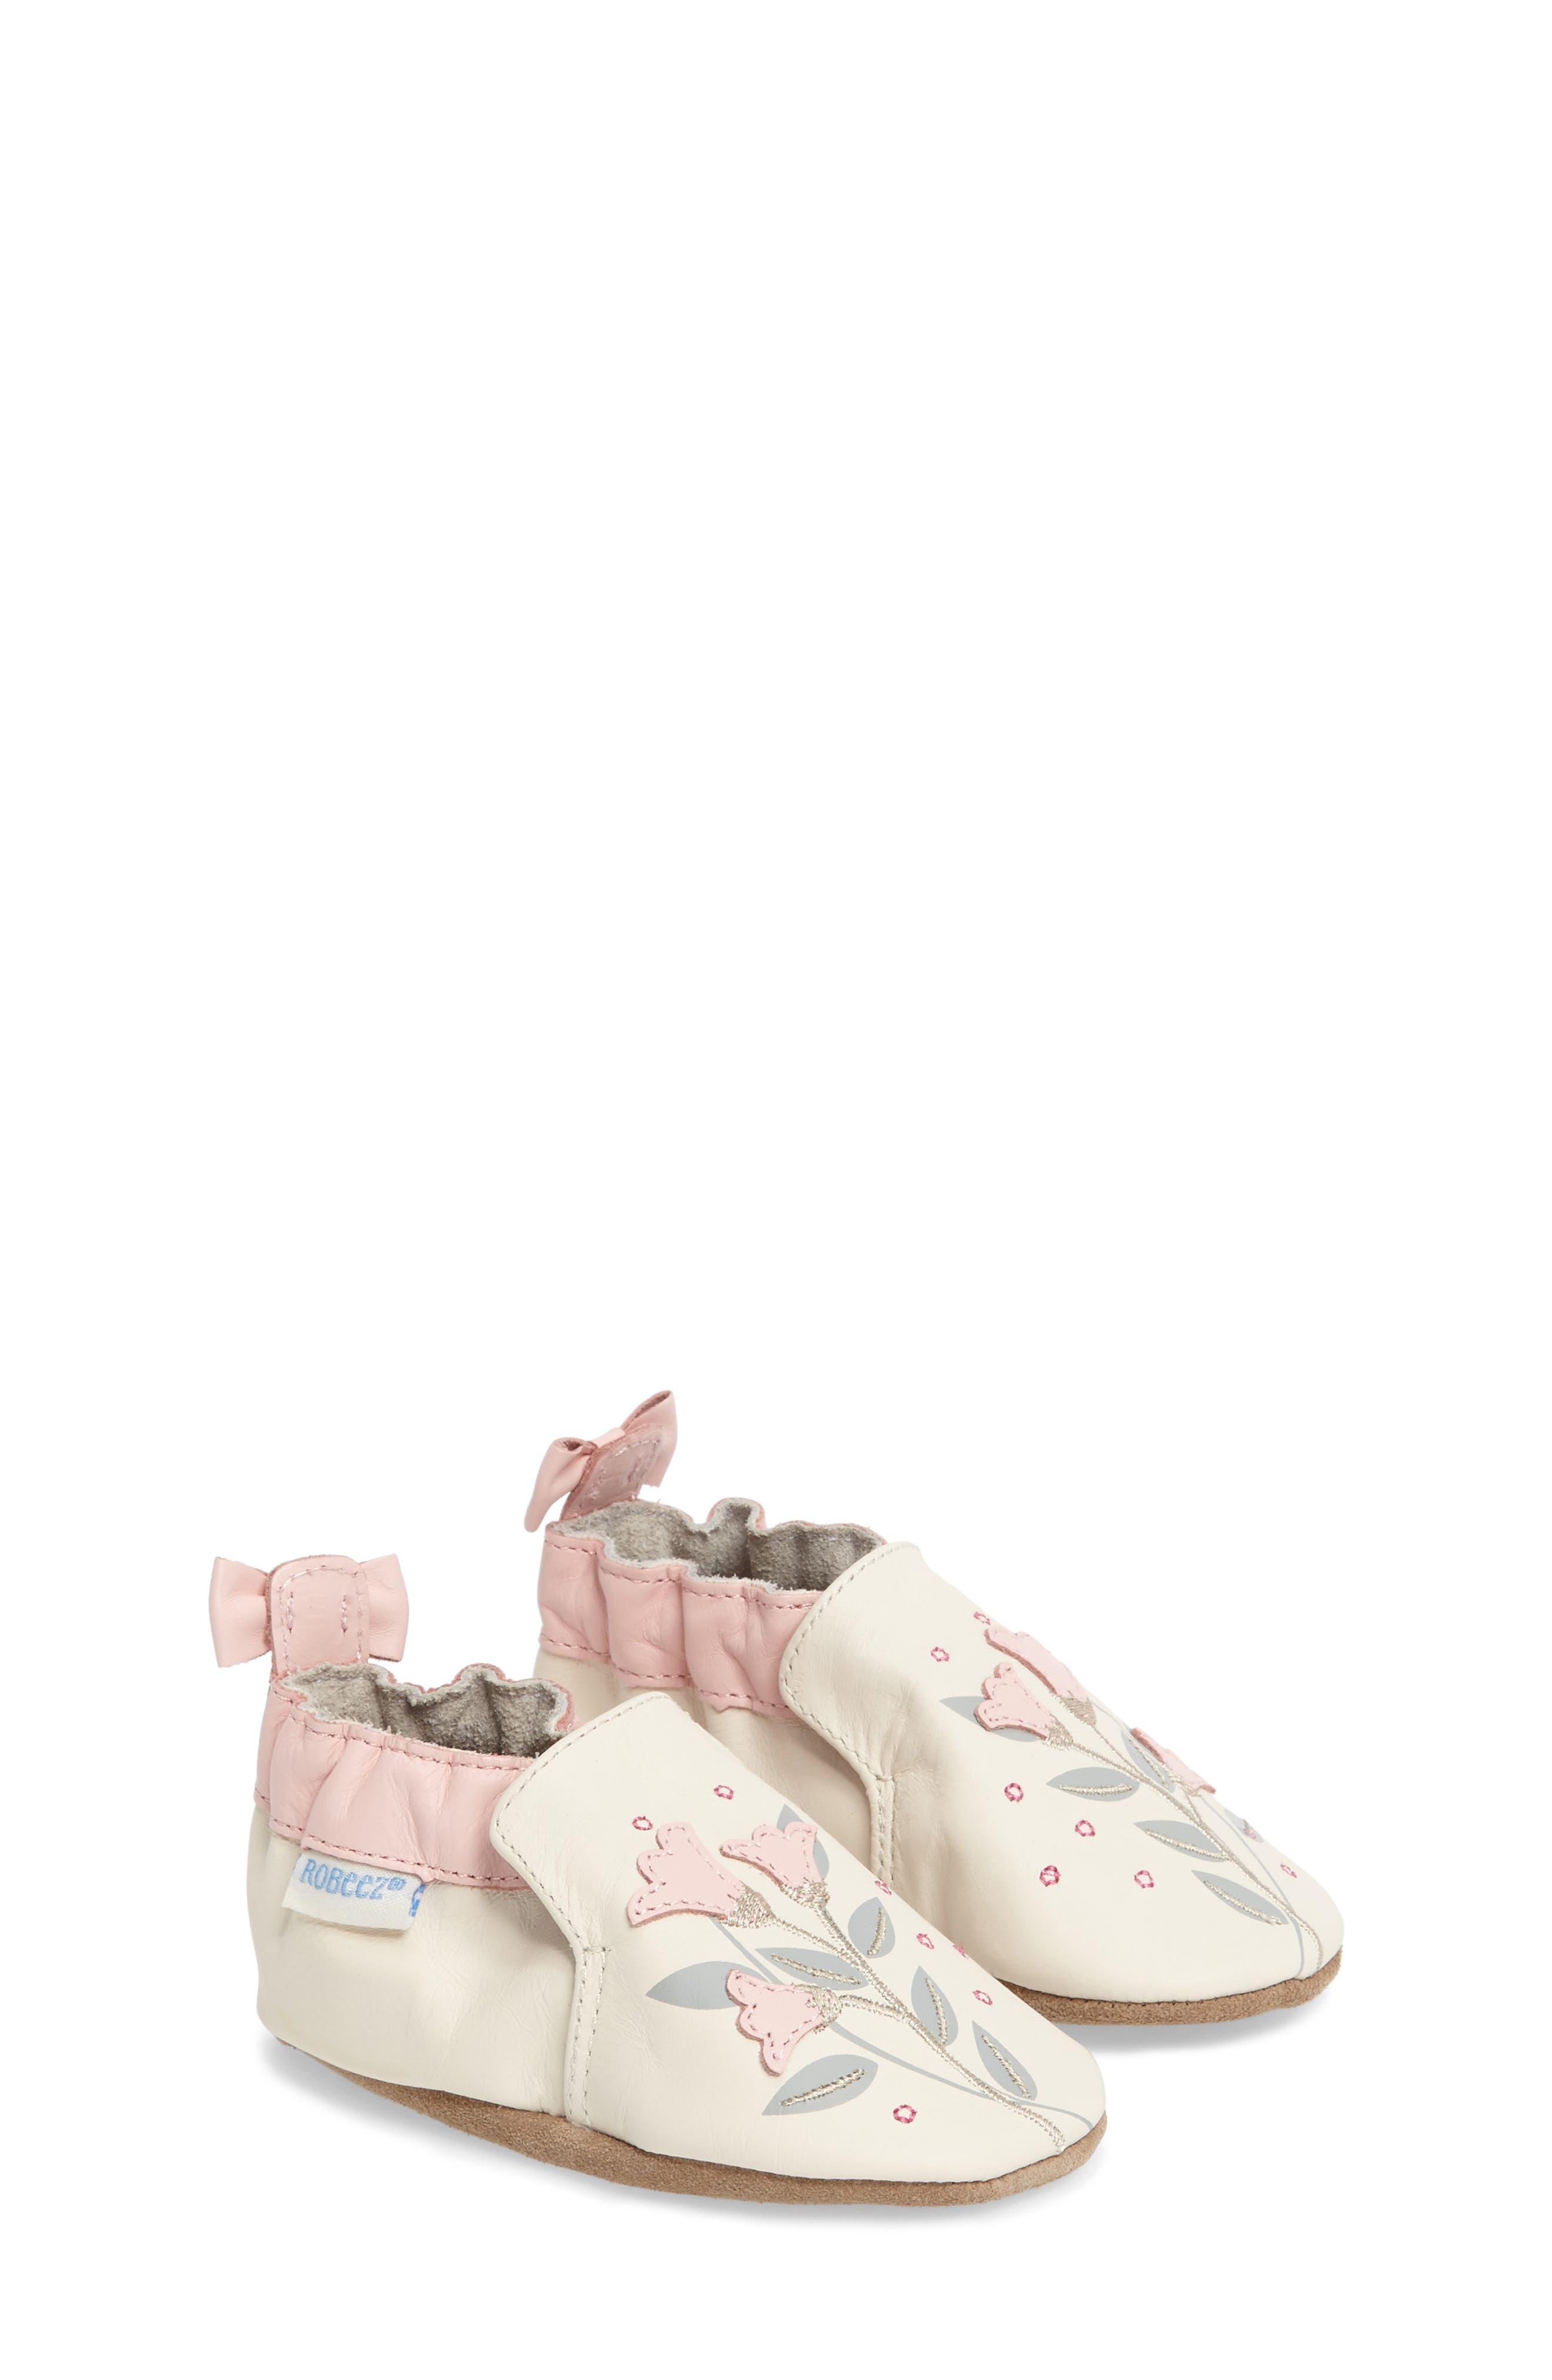 Rosealean Crib Shoe,                             Main thumbnail 1, color,                             650